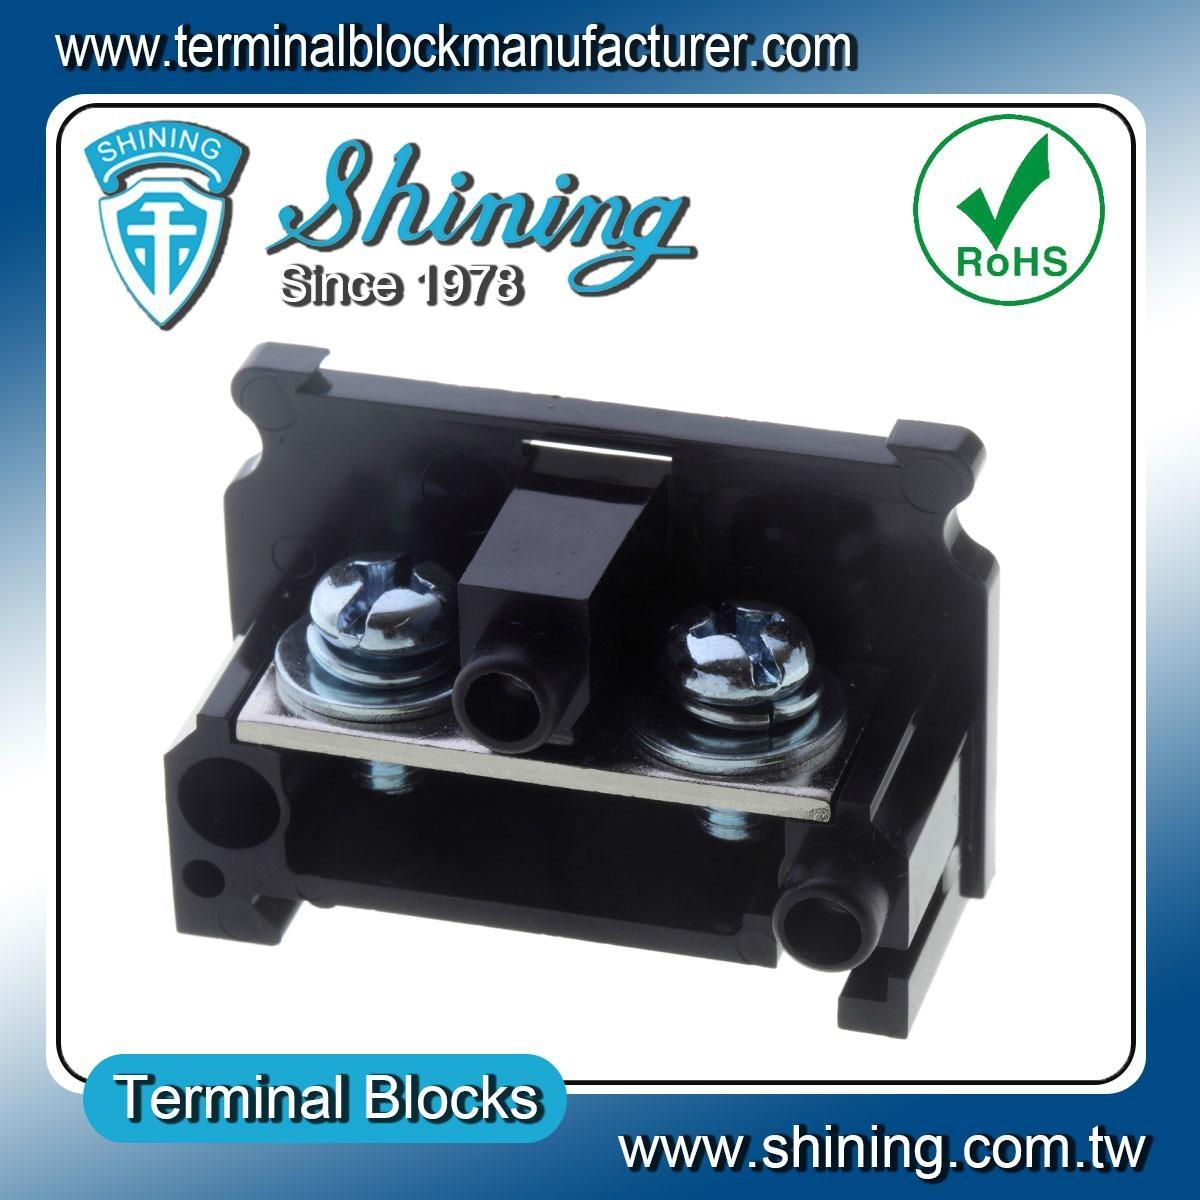 TE-060 軌道組合式端子台 Terminal Block 1